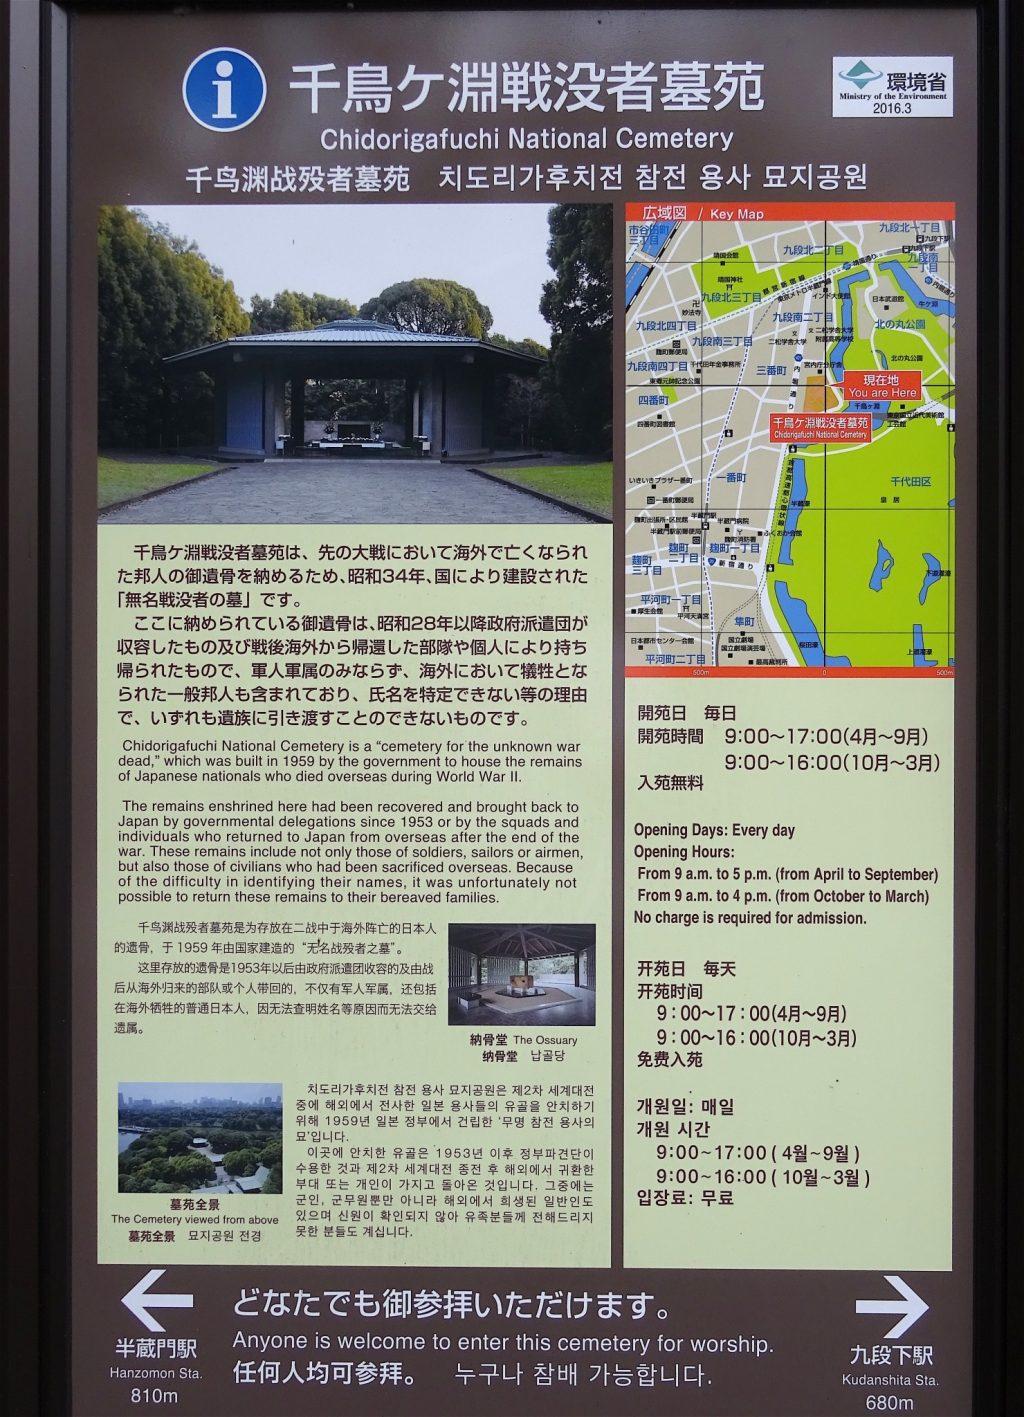 千鳥ケ淵戦没者墓苑 Chidorigafuchi National Cemetery